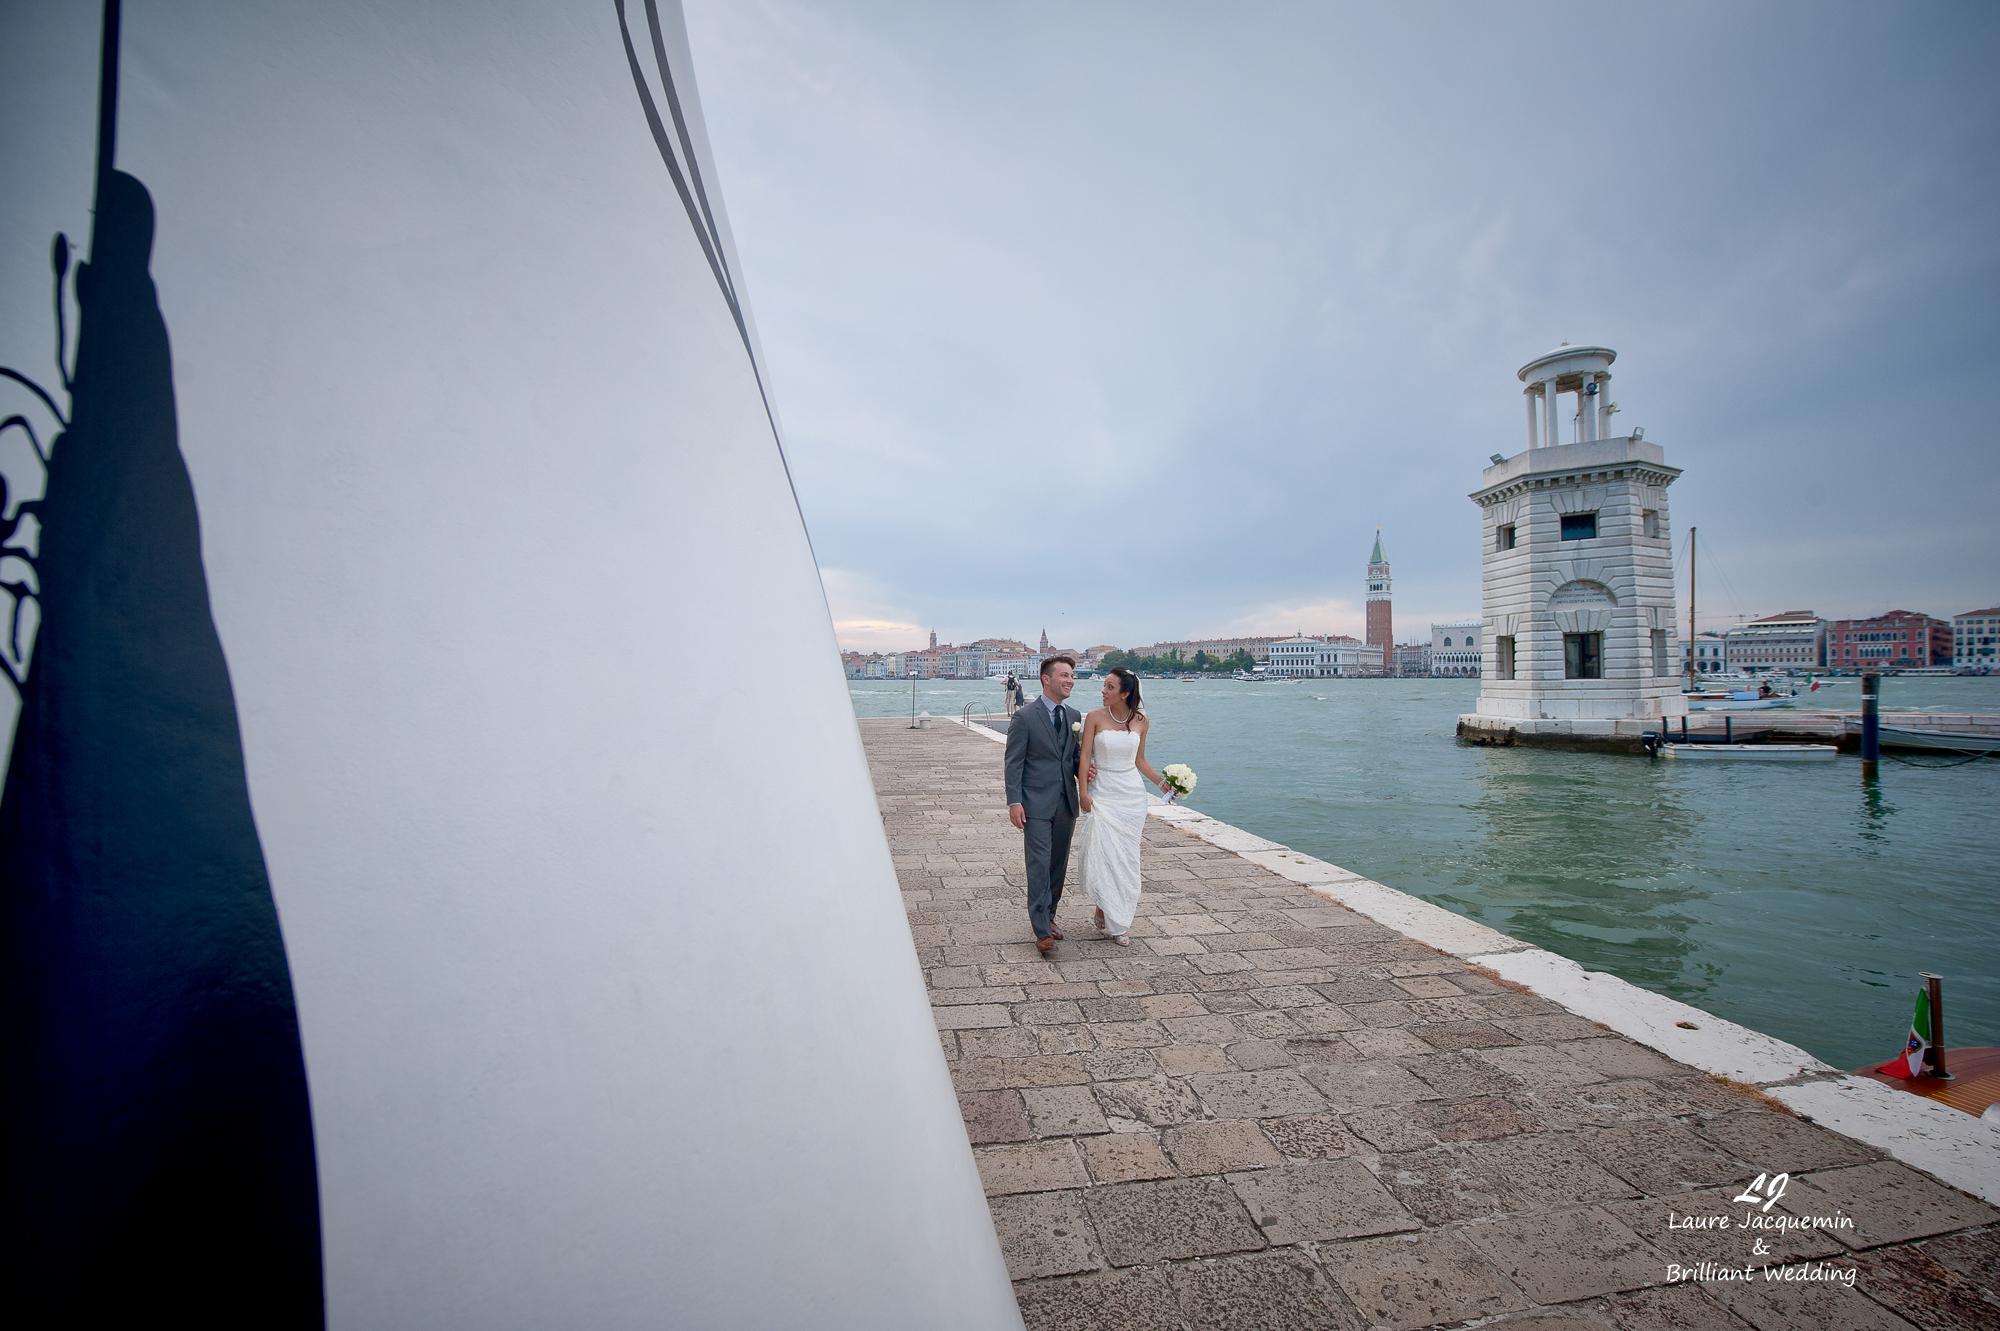 Venice Simbolic Wedding gondola venice Italy laure jacquemin photography (76) copia